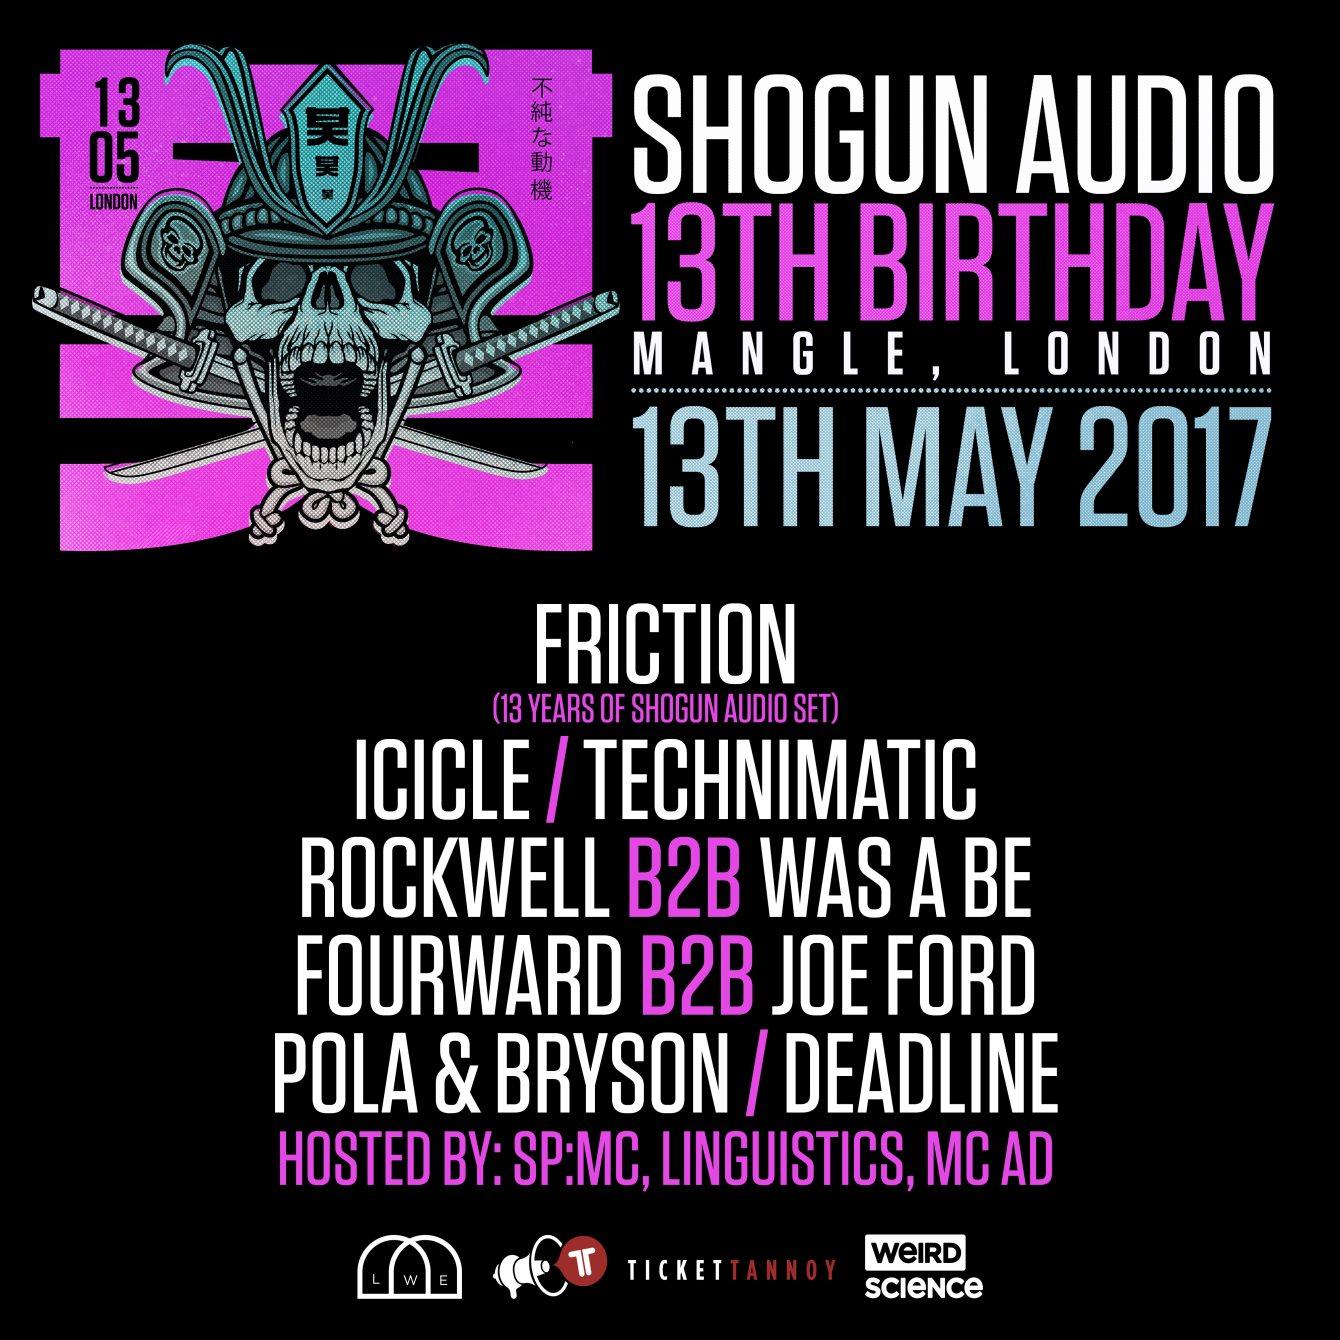 Ra Shogun Audio 13th Birthday At Mangle E8 London 2017 10 Sp Line Up